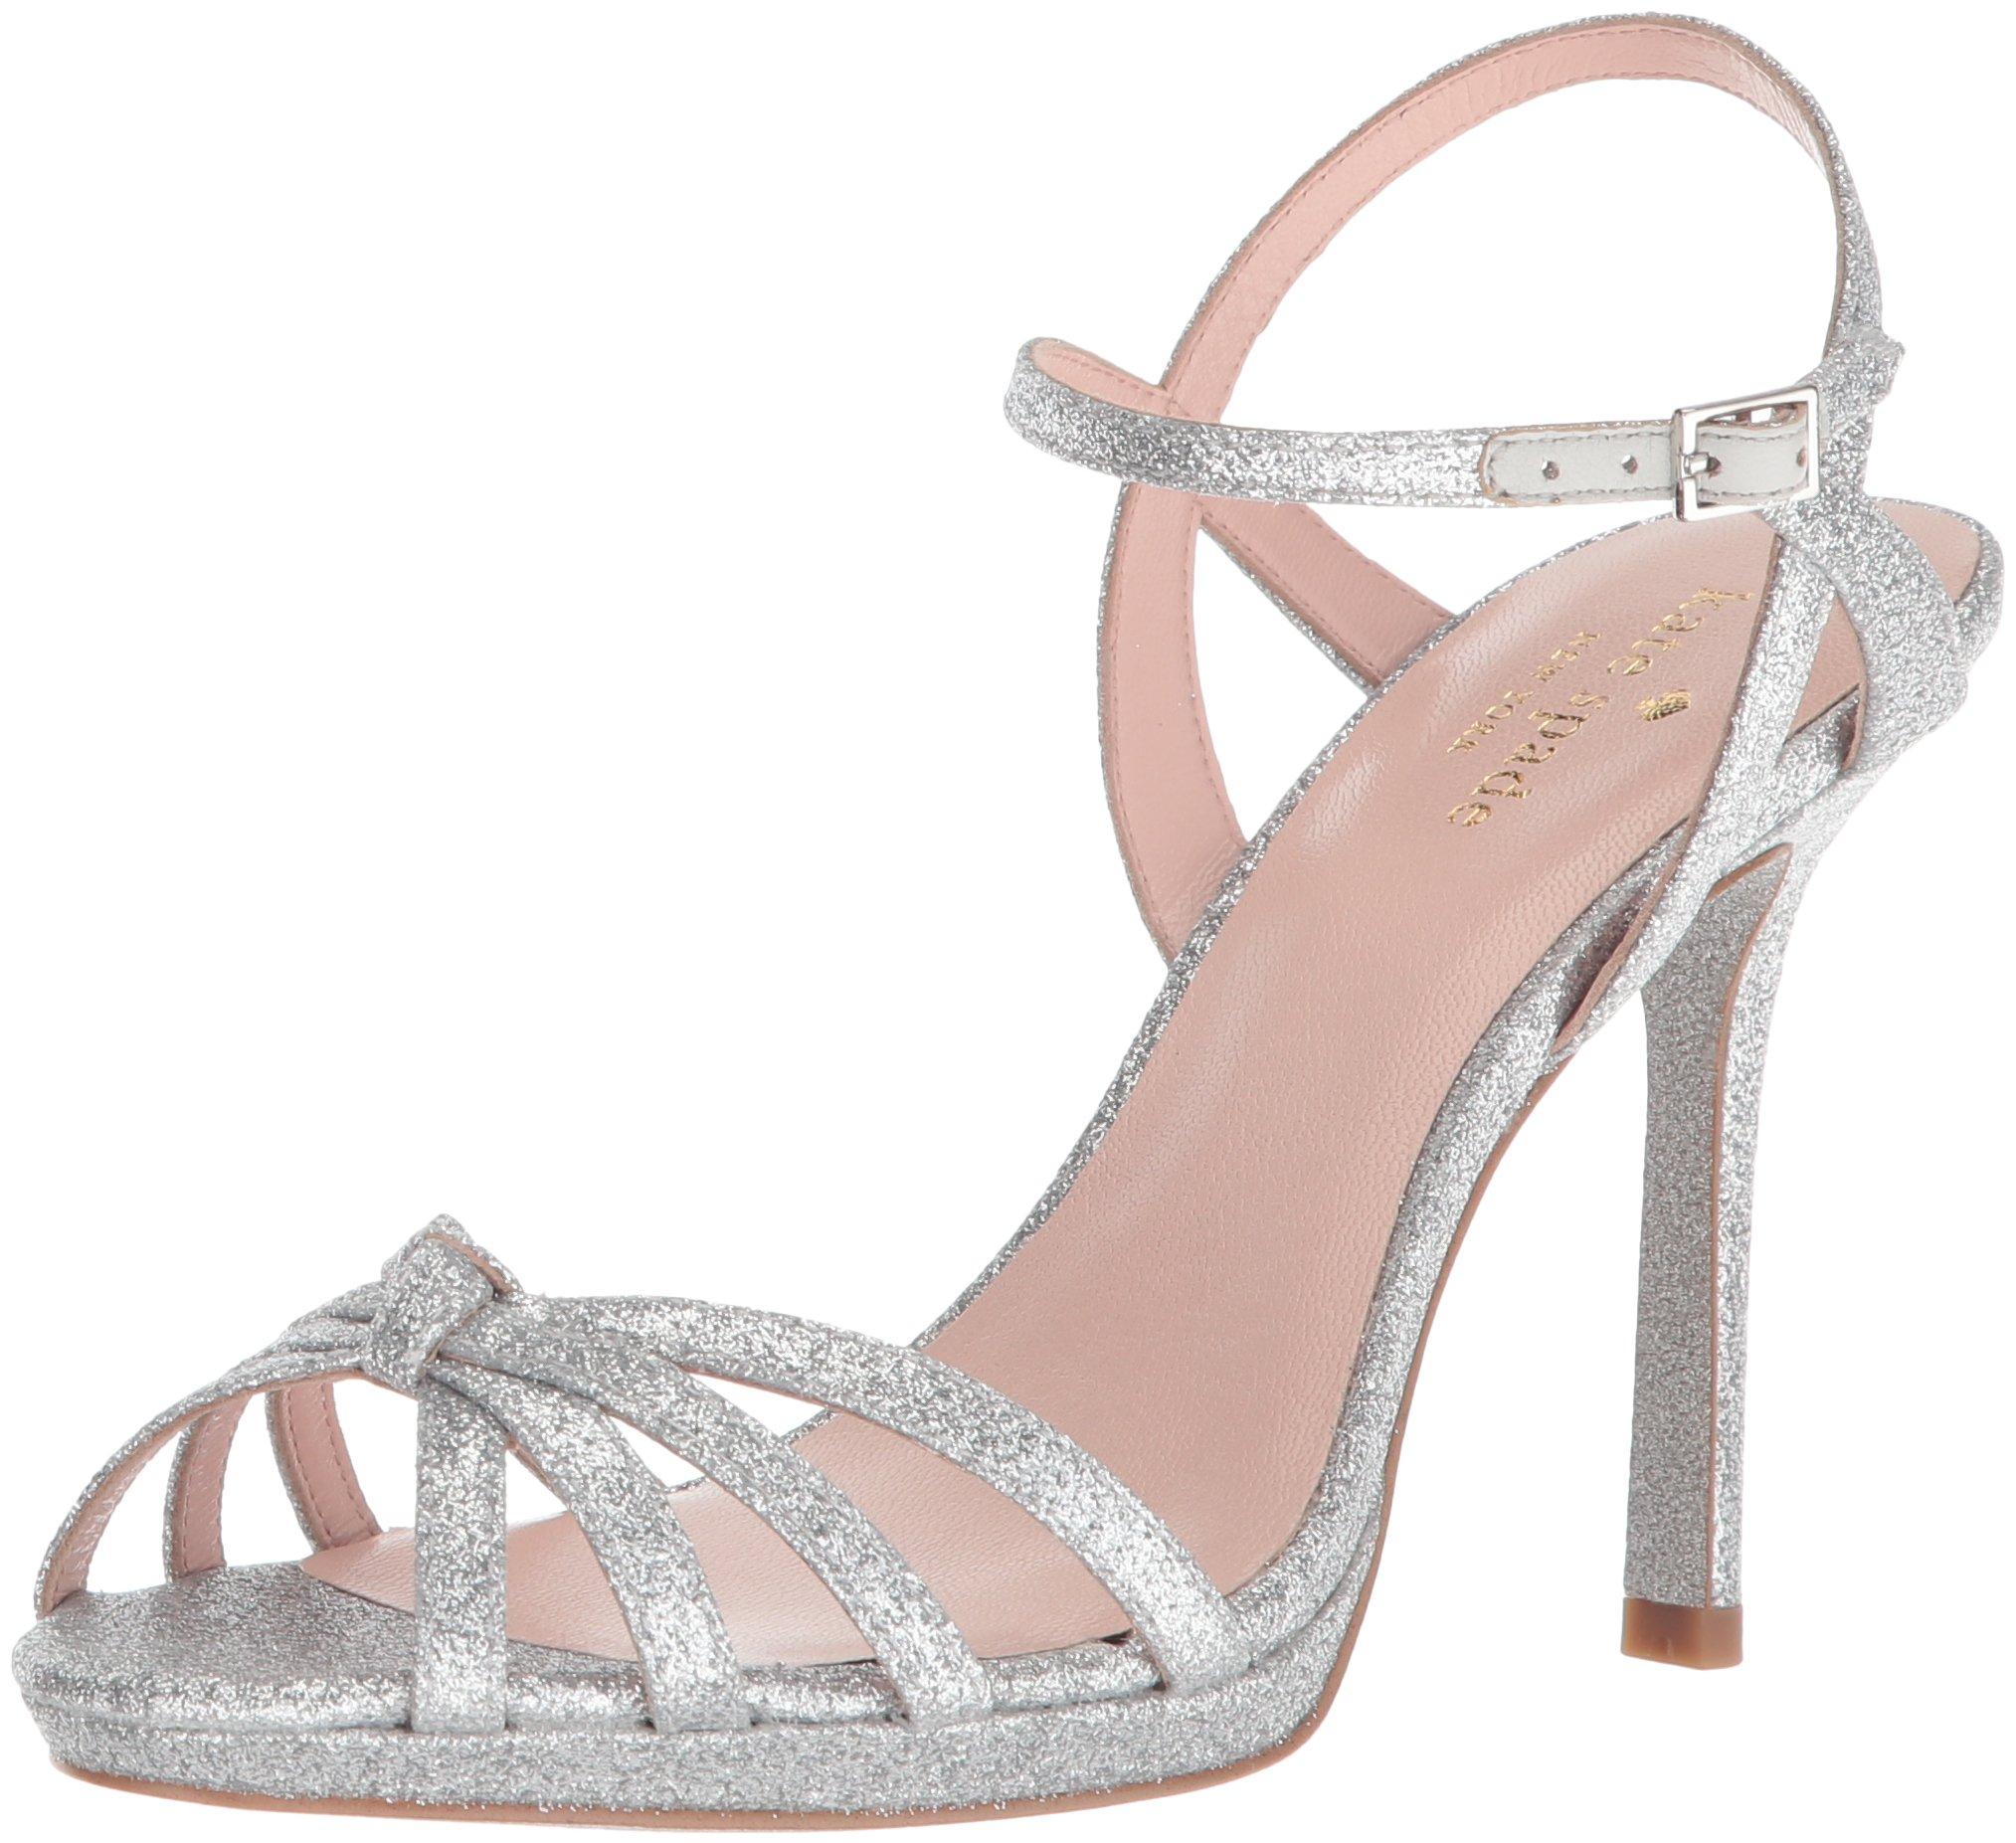 Kate Spade New York Women's Florence Heeled Sandal, Silver Thin Glitter, 7 Medium US